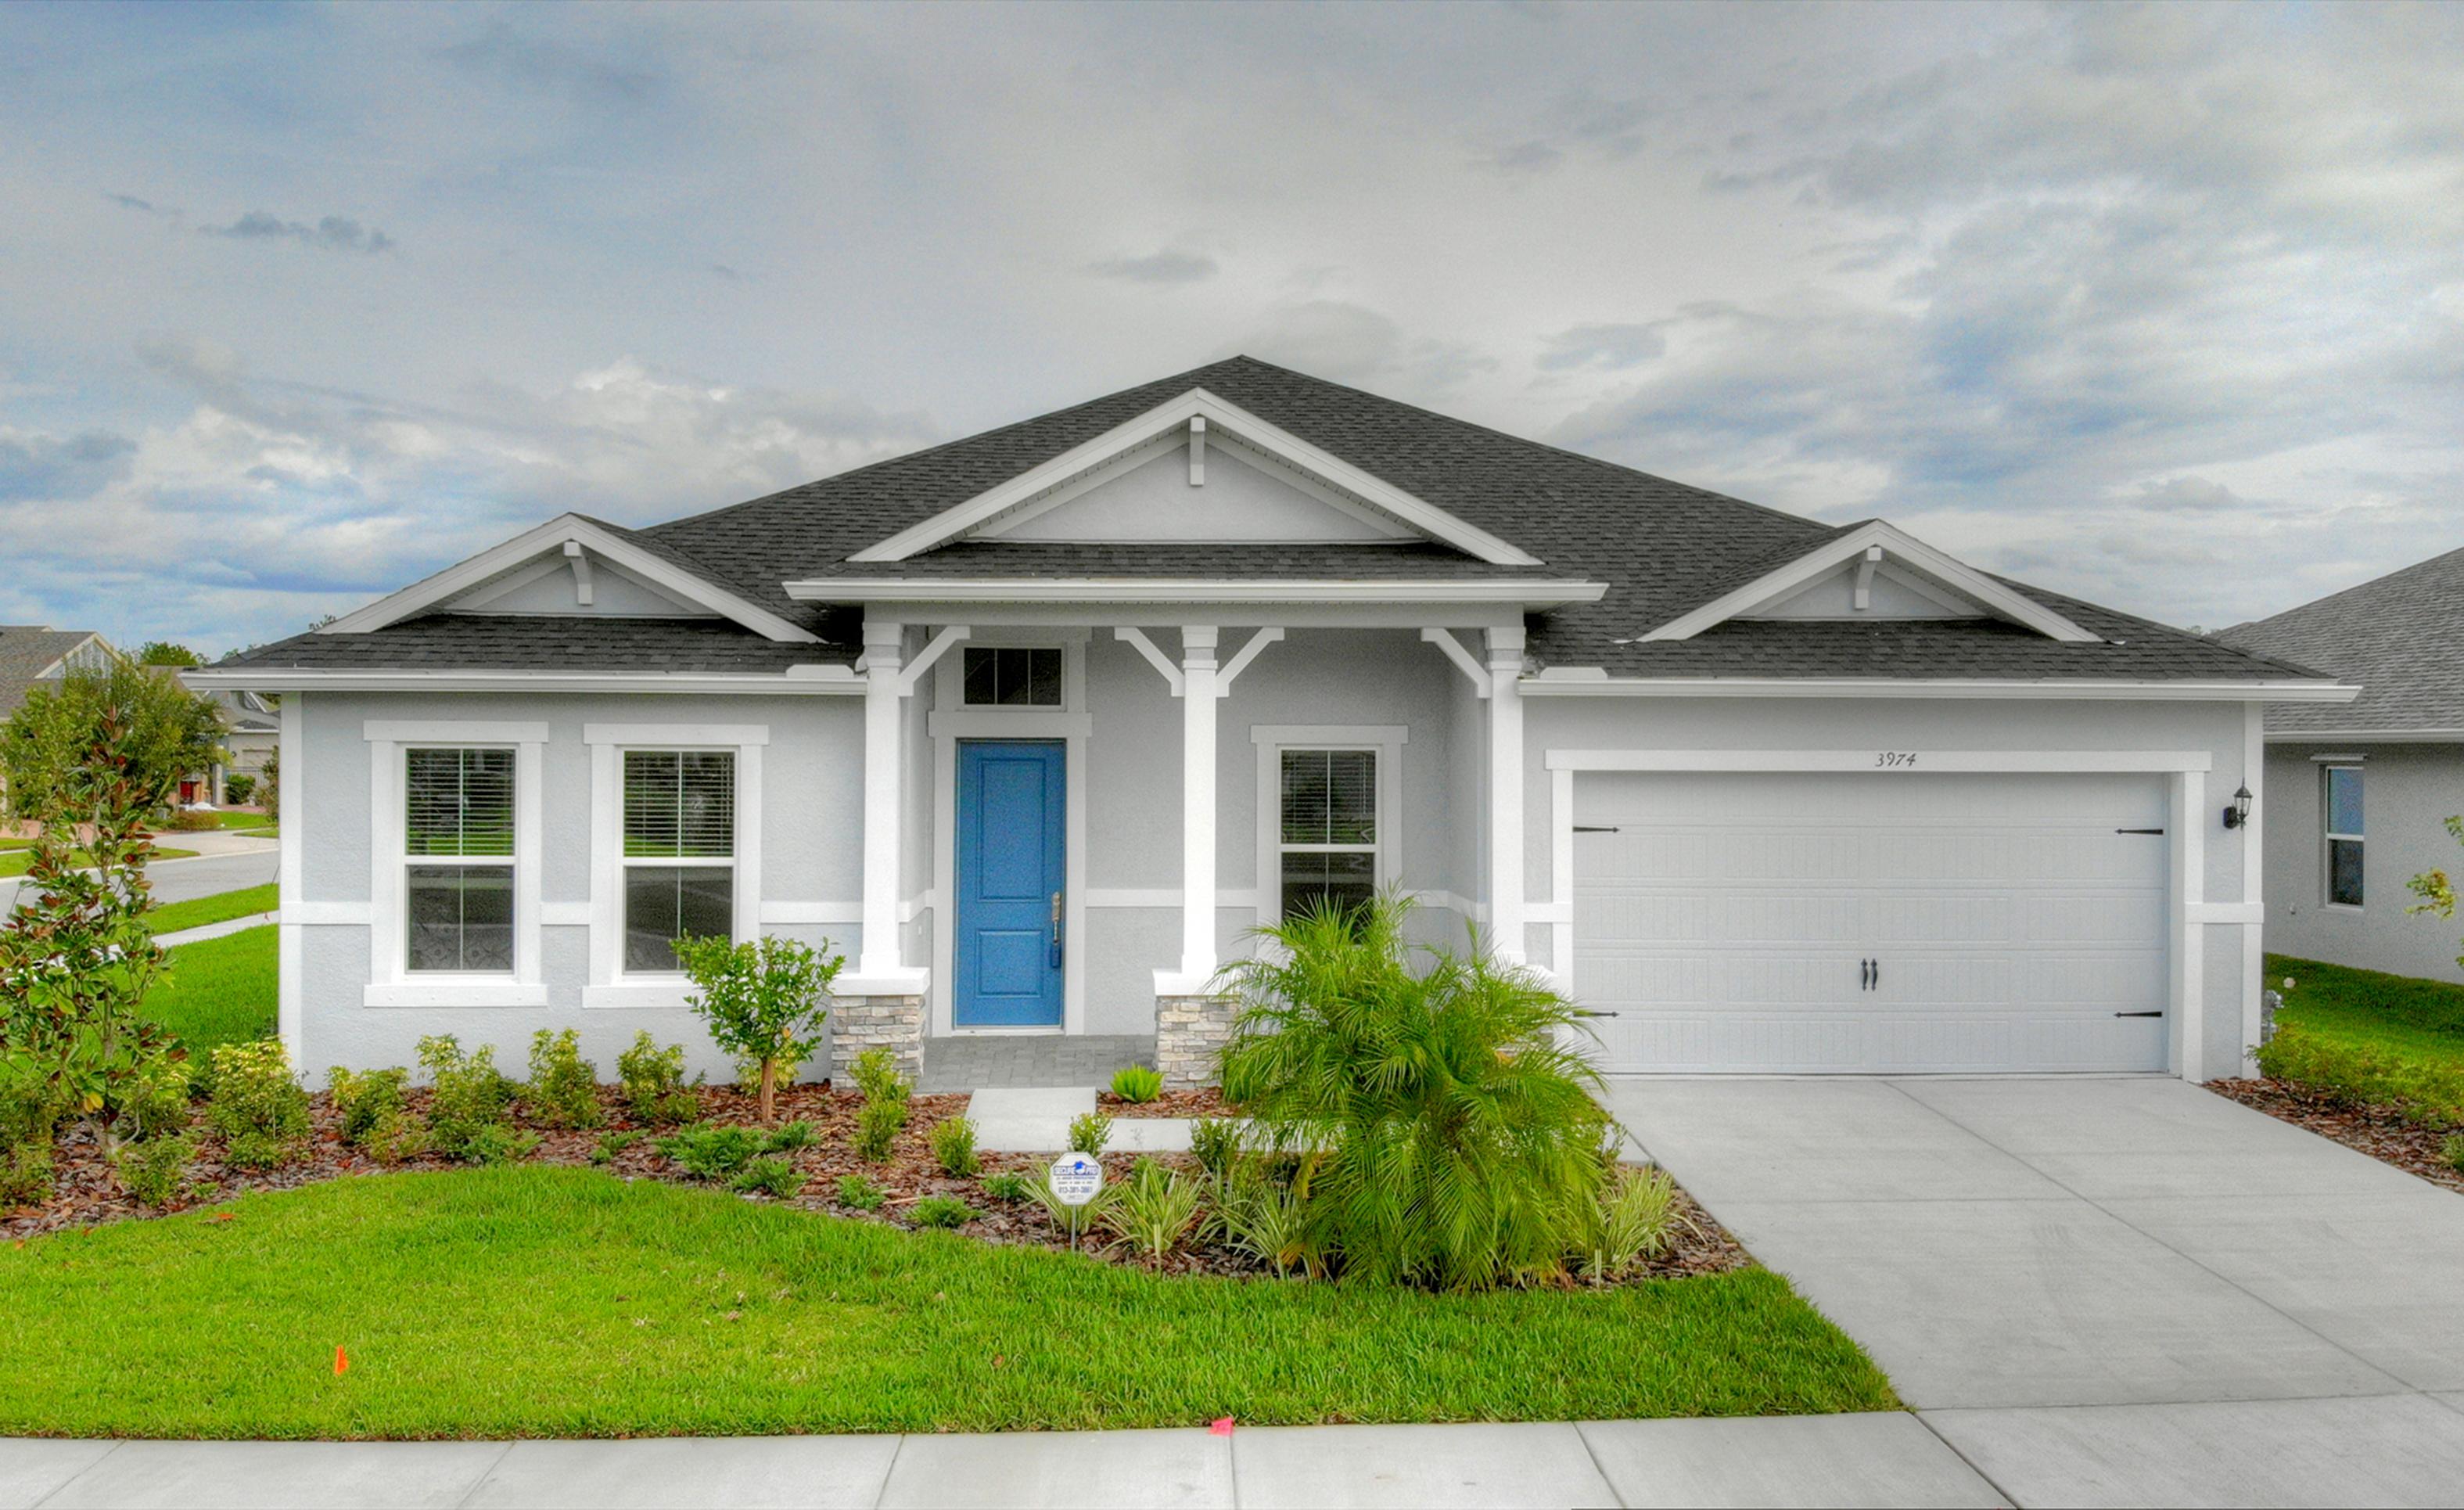 3974 Blue Lantana Lane, Land O' Lakes FL